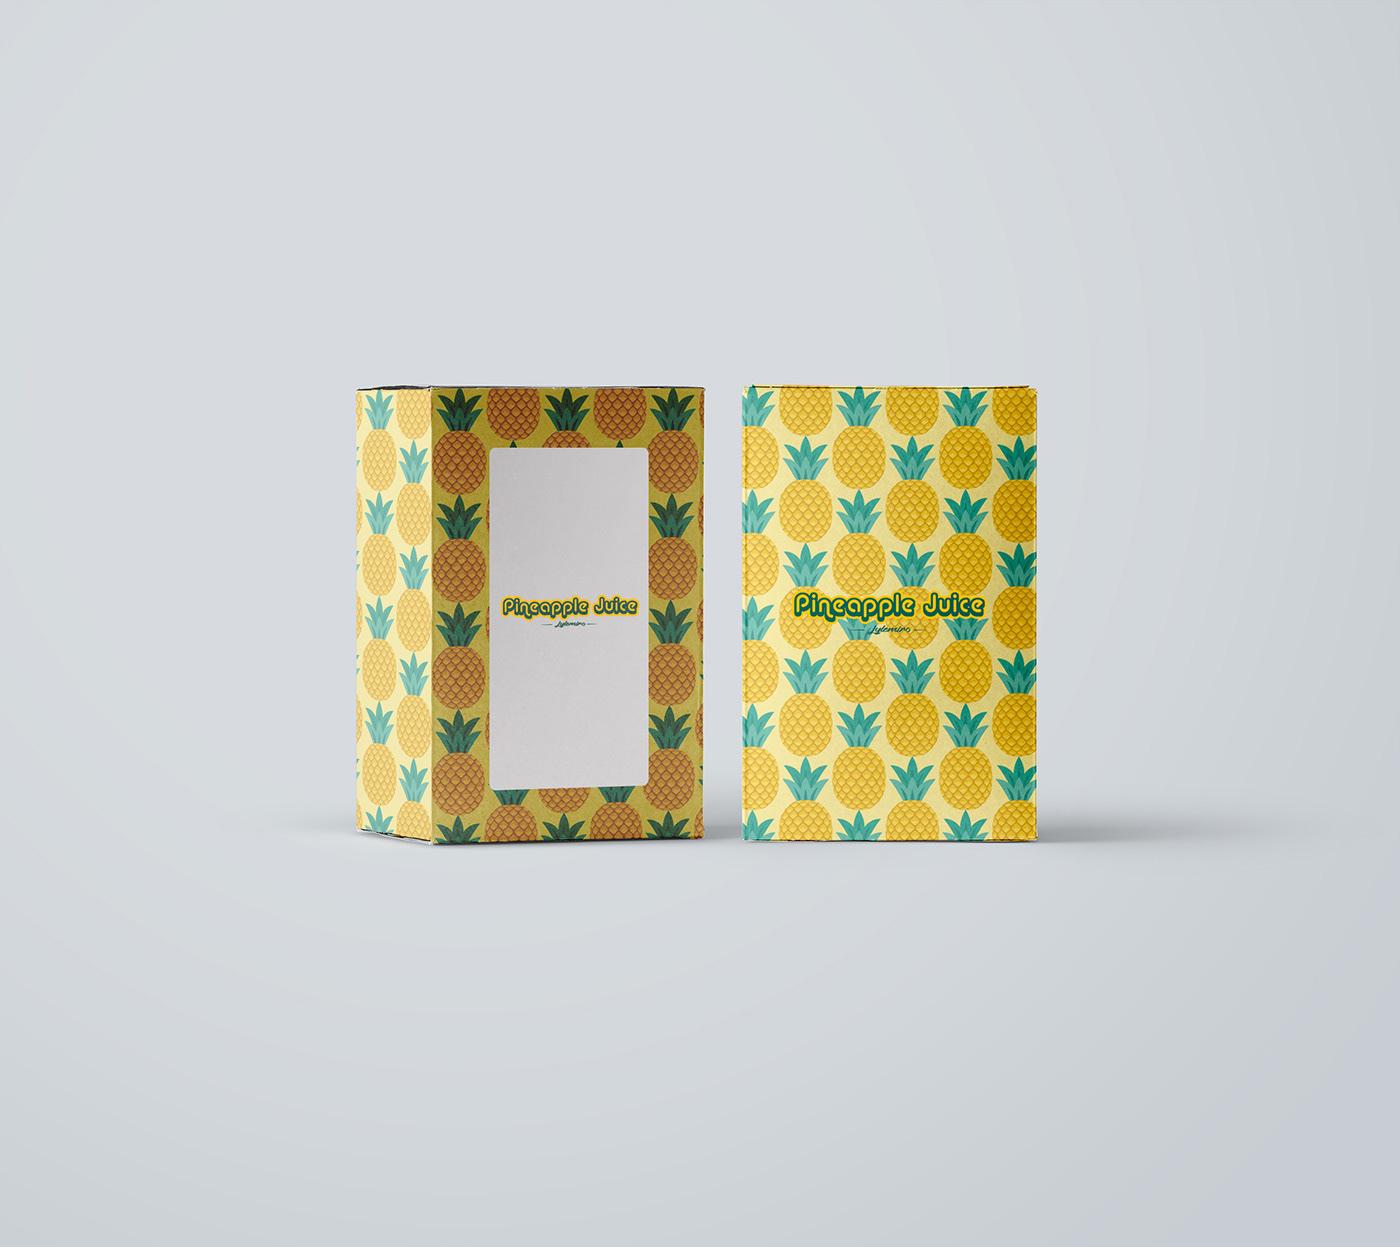 Mockup product product design  cup design box design free mockup